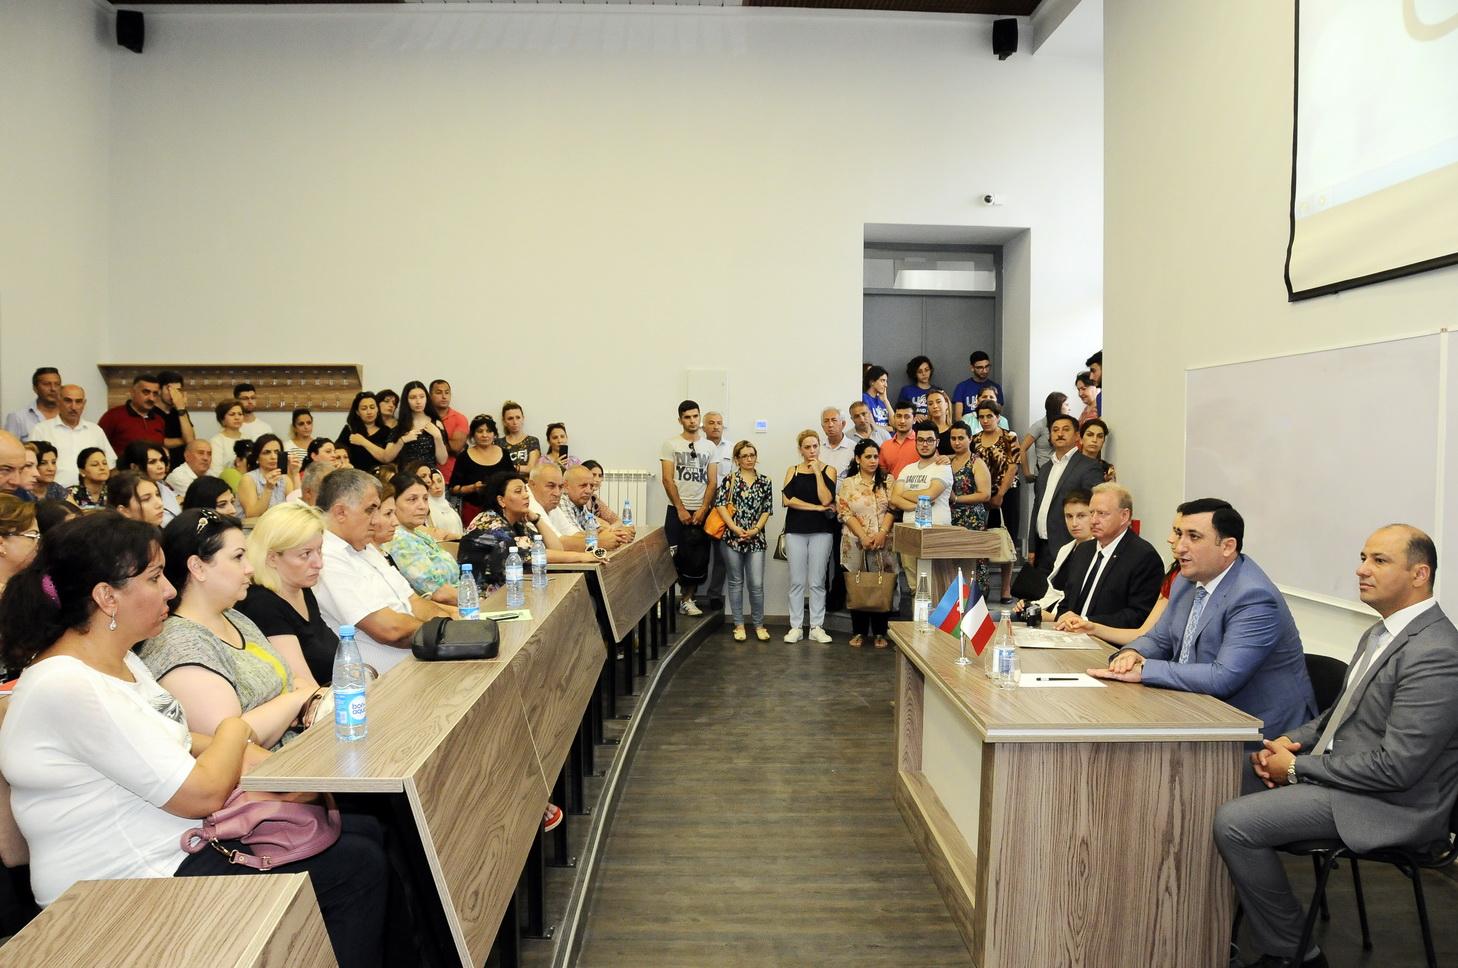 UFAZ-a qəbul imtahanında rekord sayda abituriyent iştirak edib - FOTO